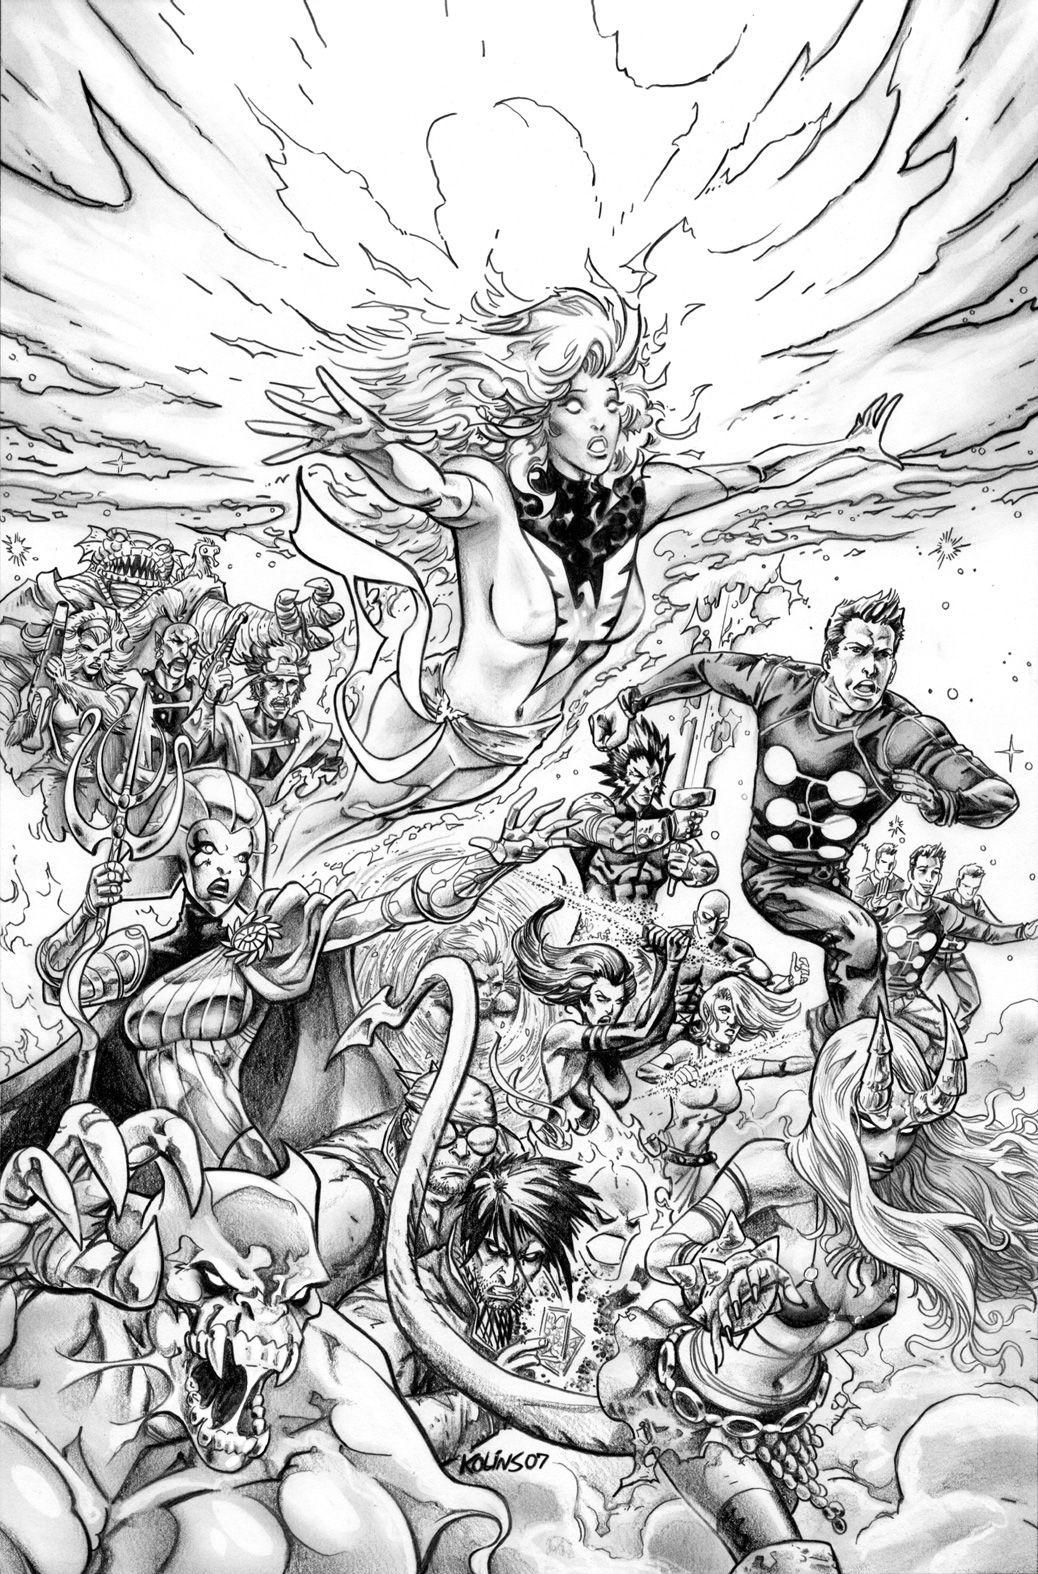 Konabeun Com Zum Ausdrucken Ausmalbilder Comic K13560 Bilder